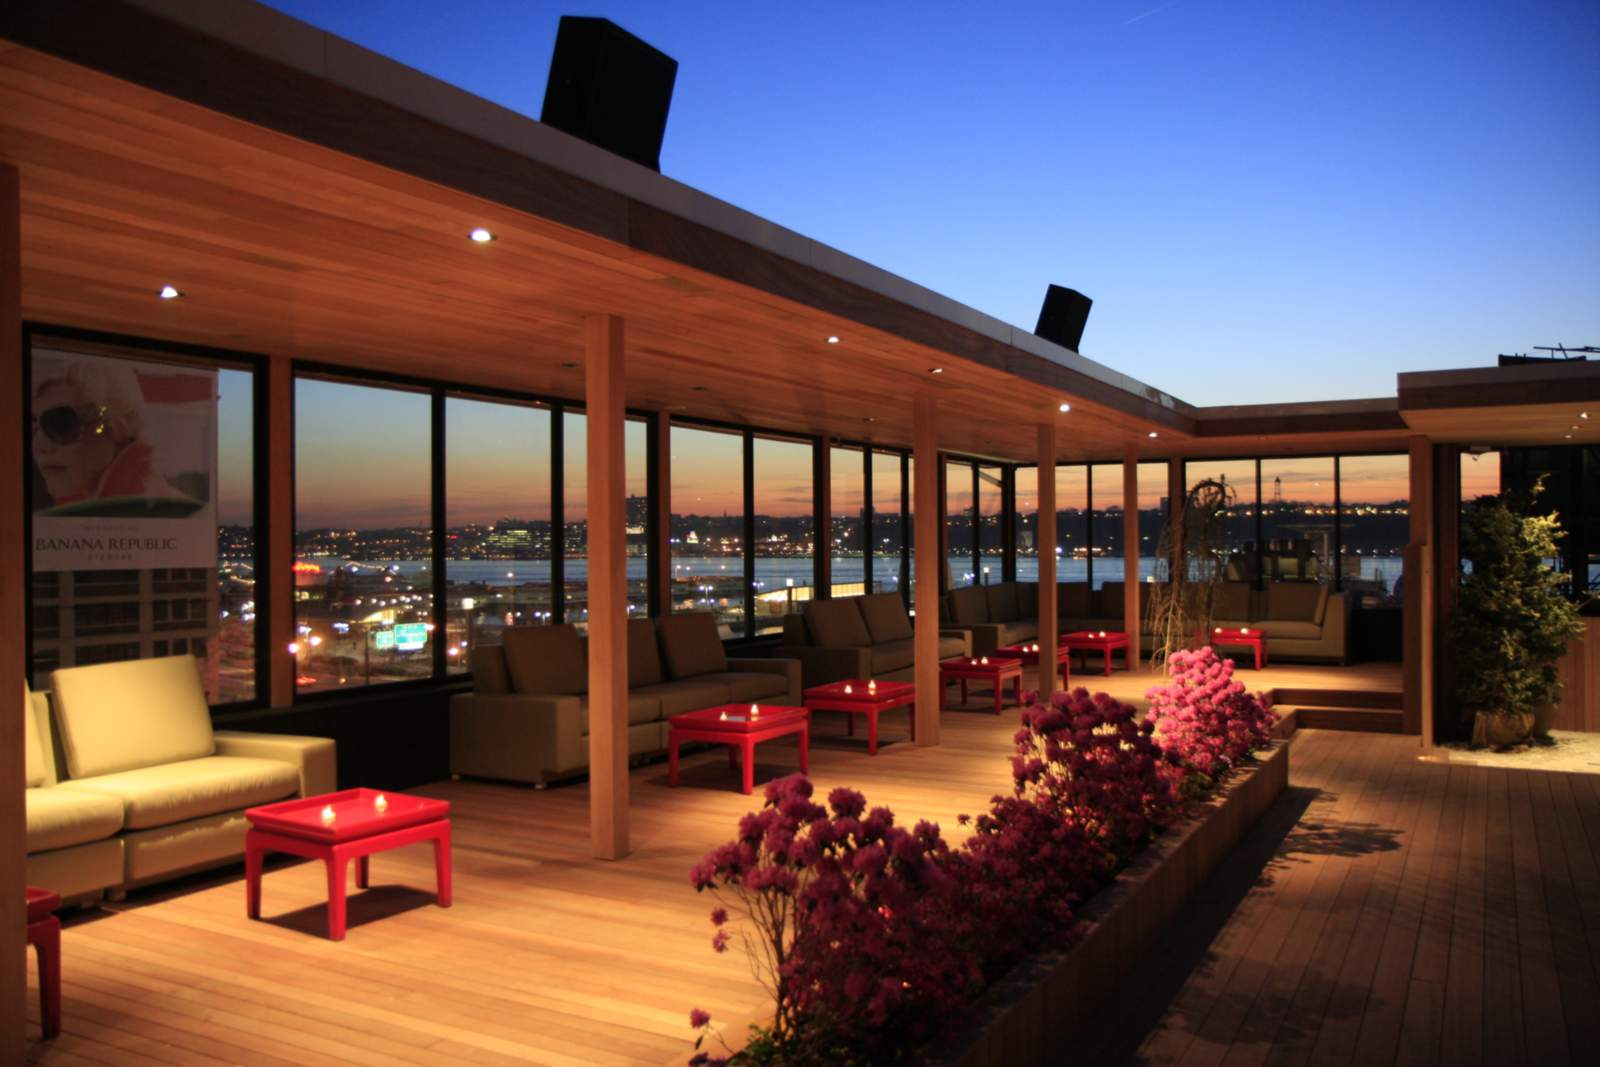 Hudson hotel new york nyc 2013 003 - Filename Rooftop Hudson Terrace Jpg